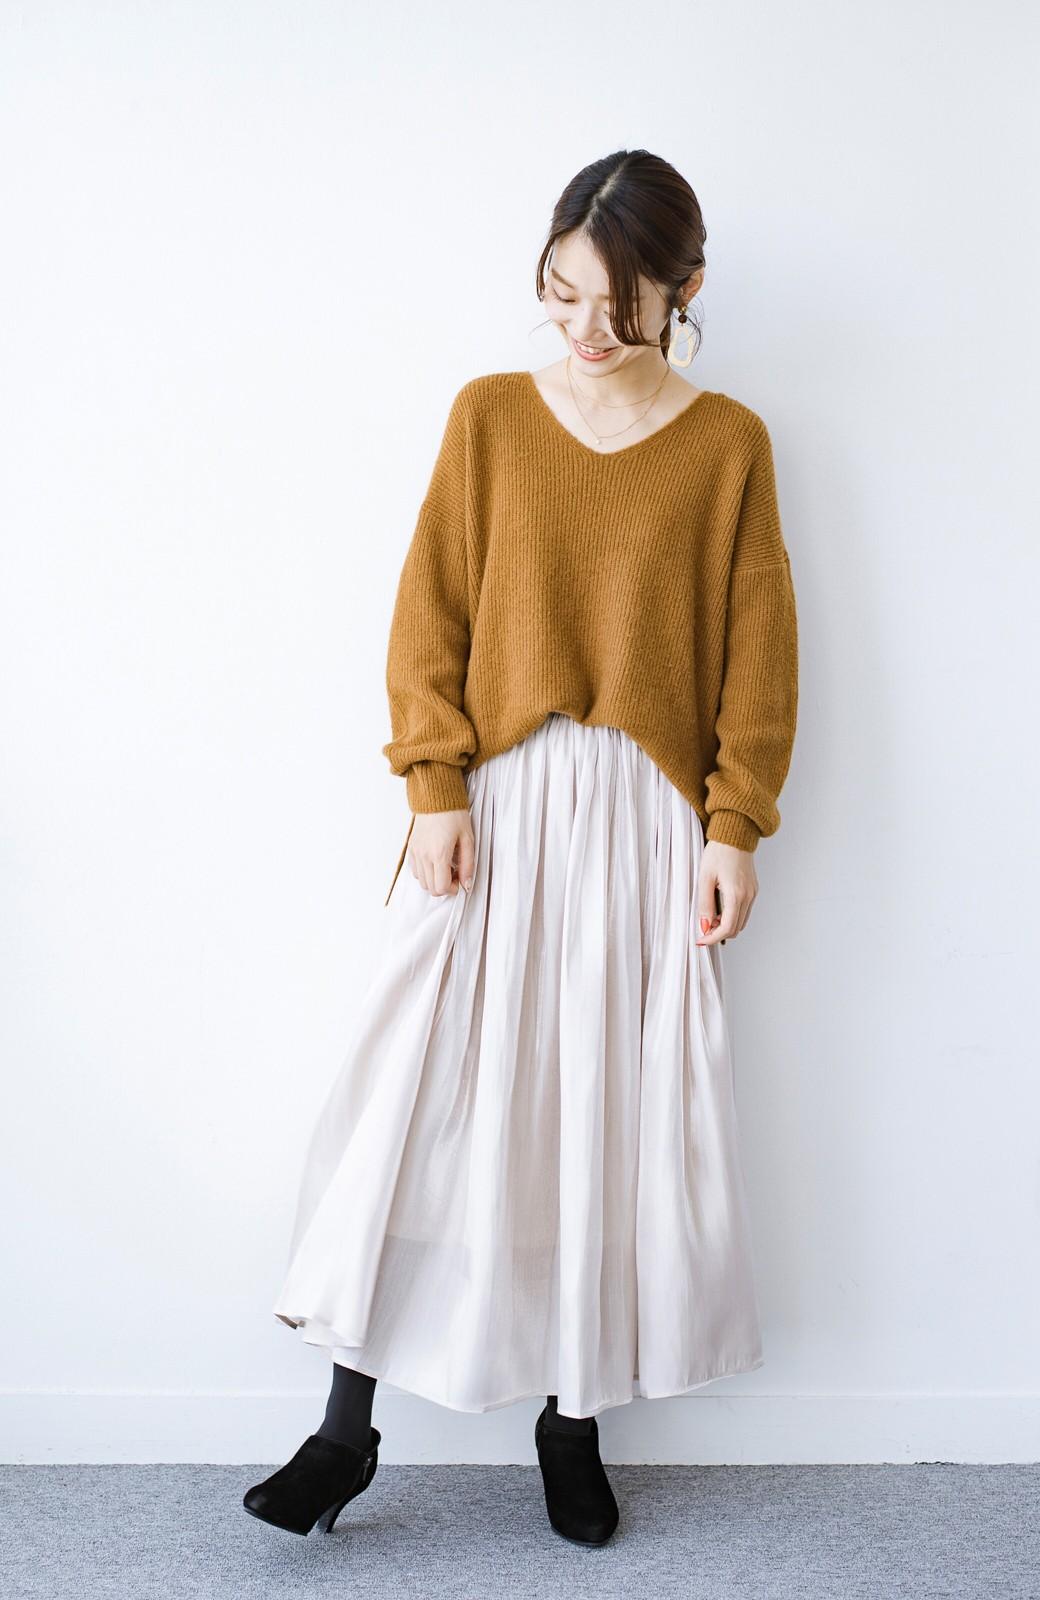 haco! 【人気のため新色追加!】1枚でも重ね着にも便利なキラキラ素材がかわいいロングスカート by laulea <アイボリー>の商品写真2